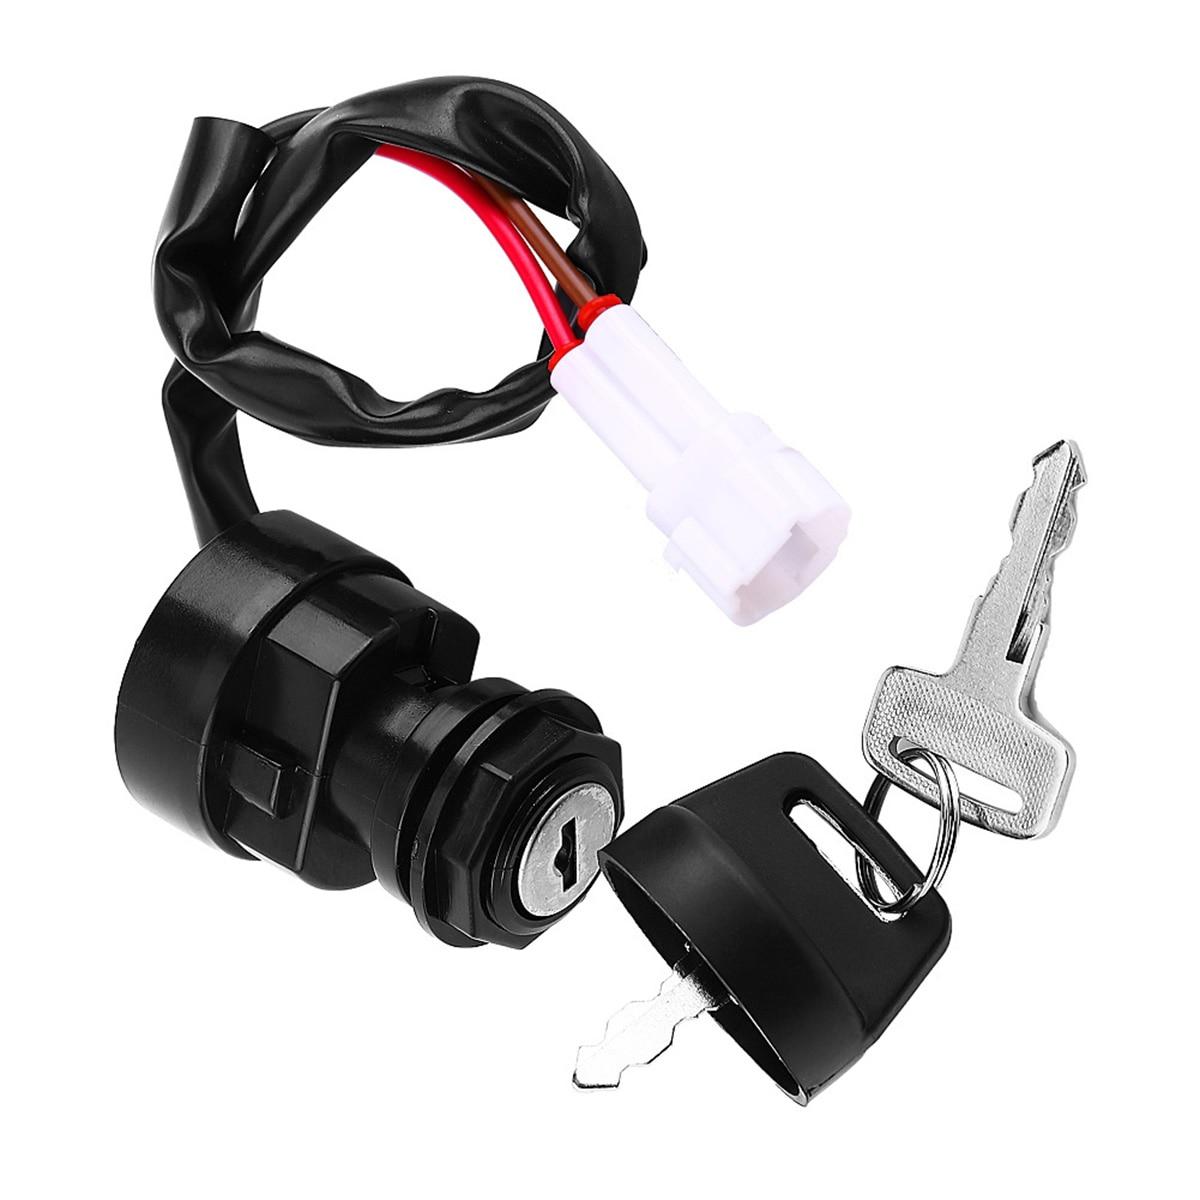 Universal 2 Ignition Keys Start Switch Door Lock Key Motorcycle Accessory For Yamaha YFM 350 Bruin 660R 700R Raptor 350X Warrior